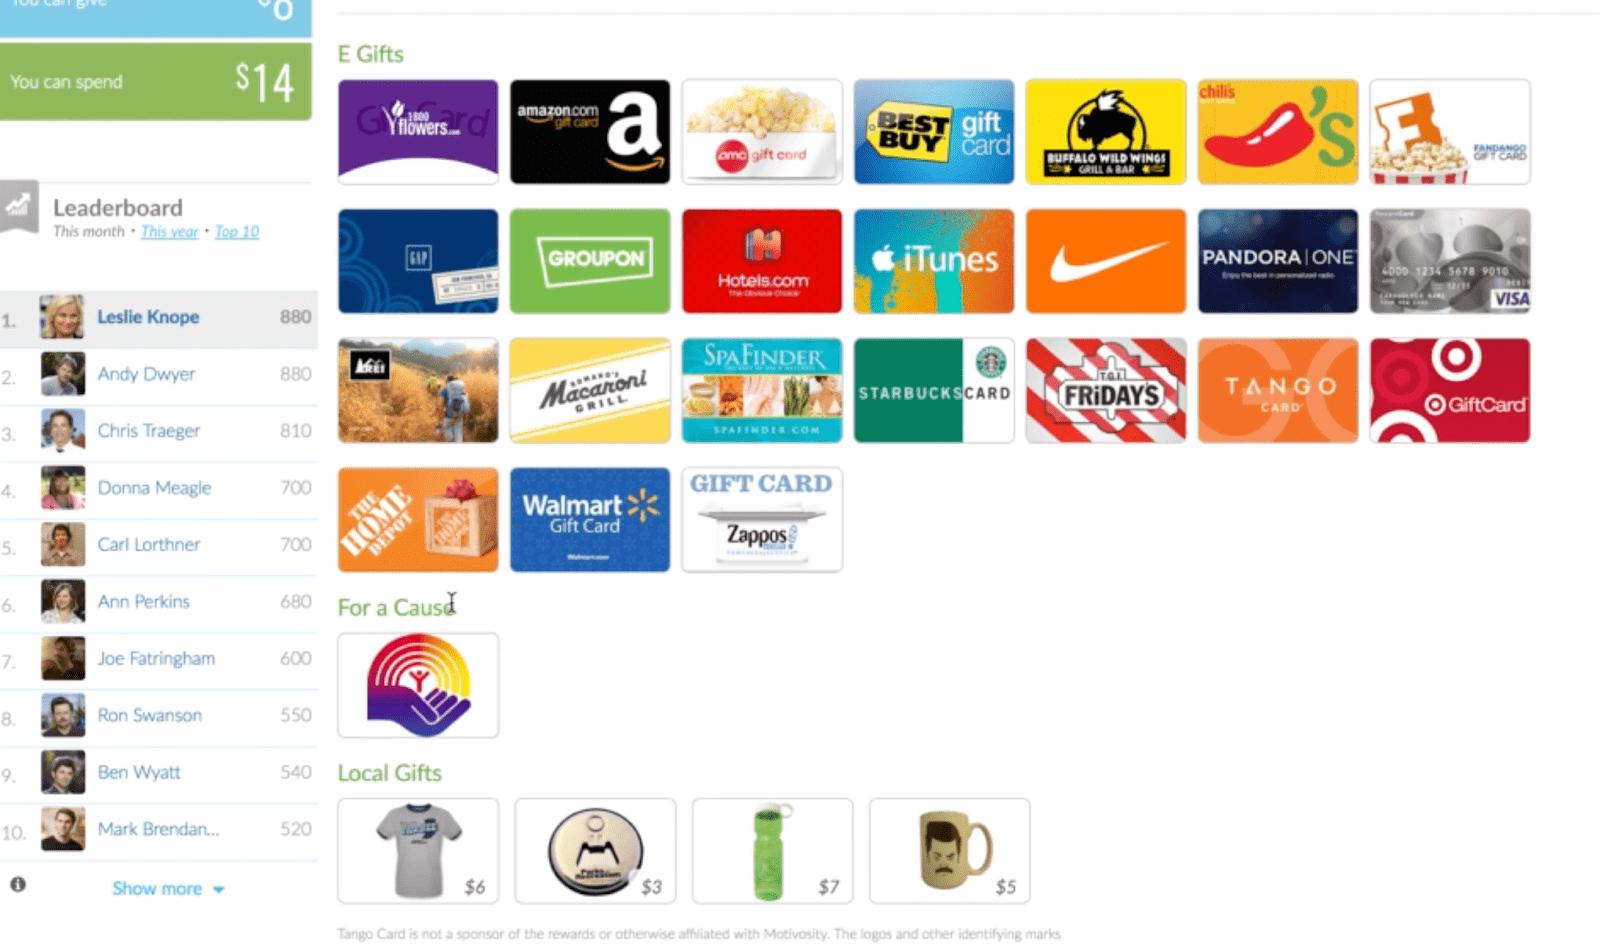 Rewards available on Motivosity employee engagement app including Amazon, Best Buy and Walmart.